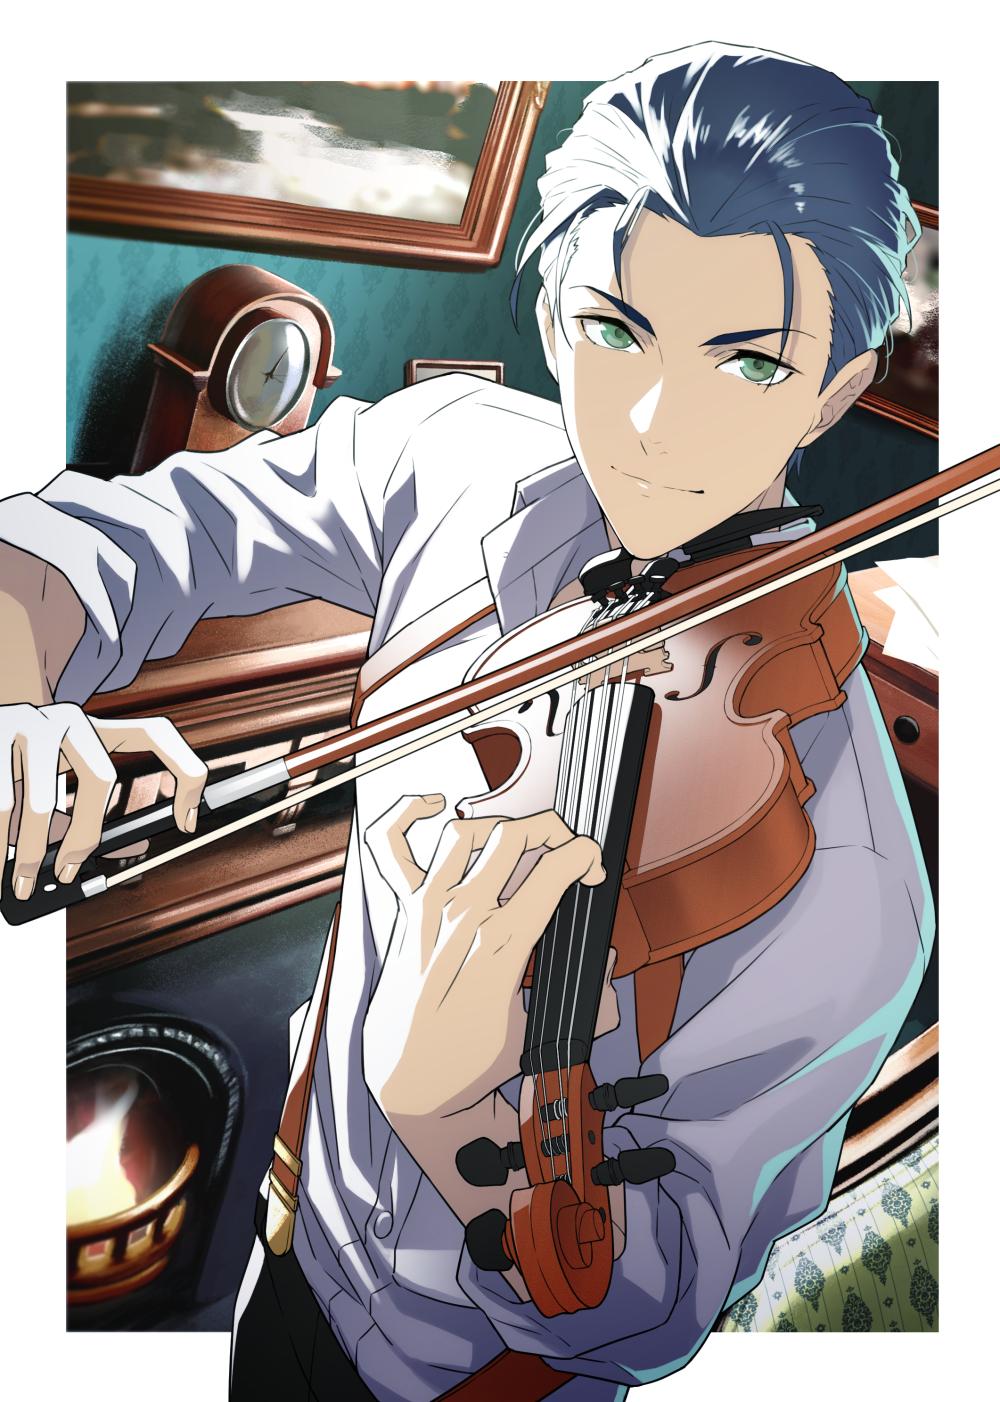 Pin by Aiden Souma on AL(anime lover) Anime, Anime guys